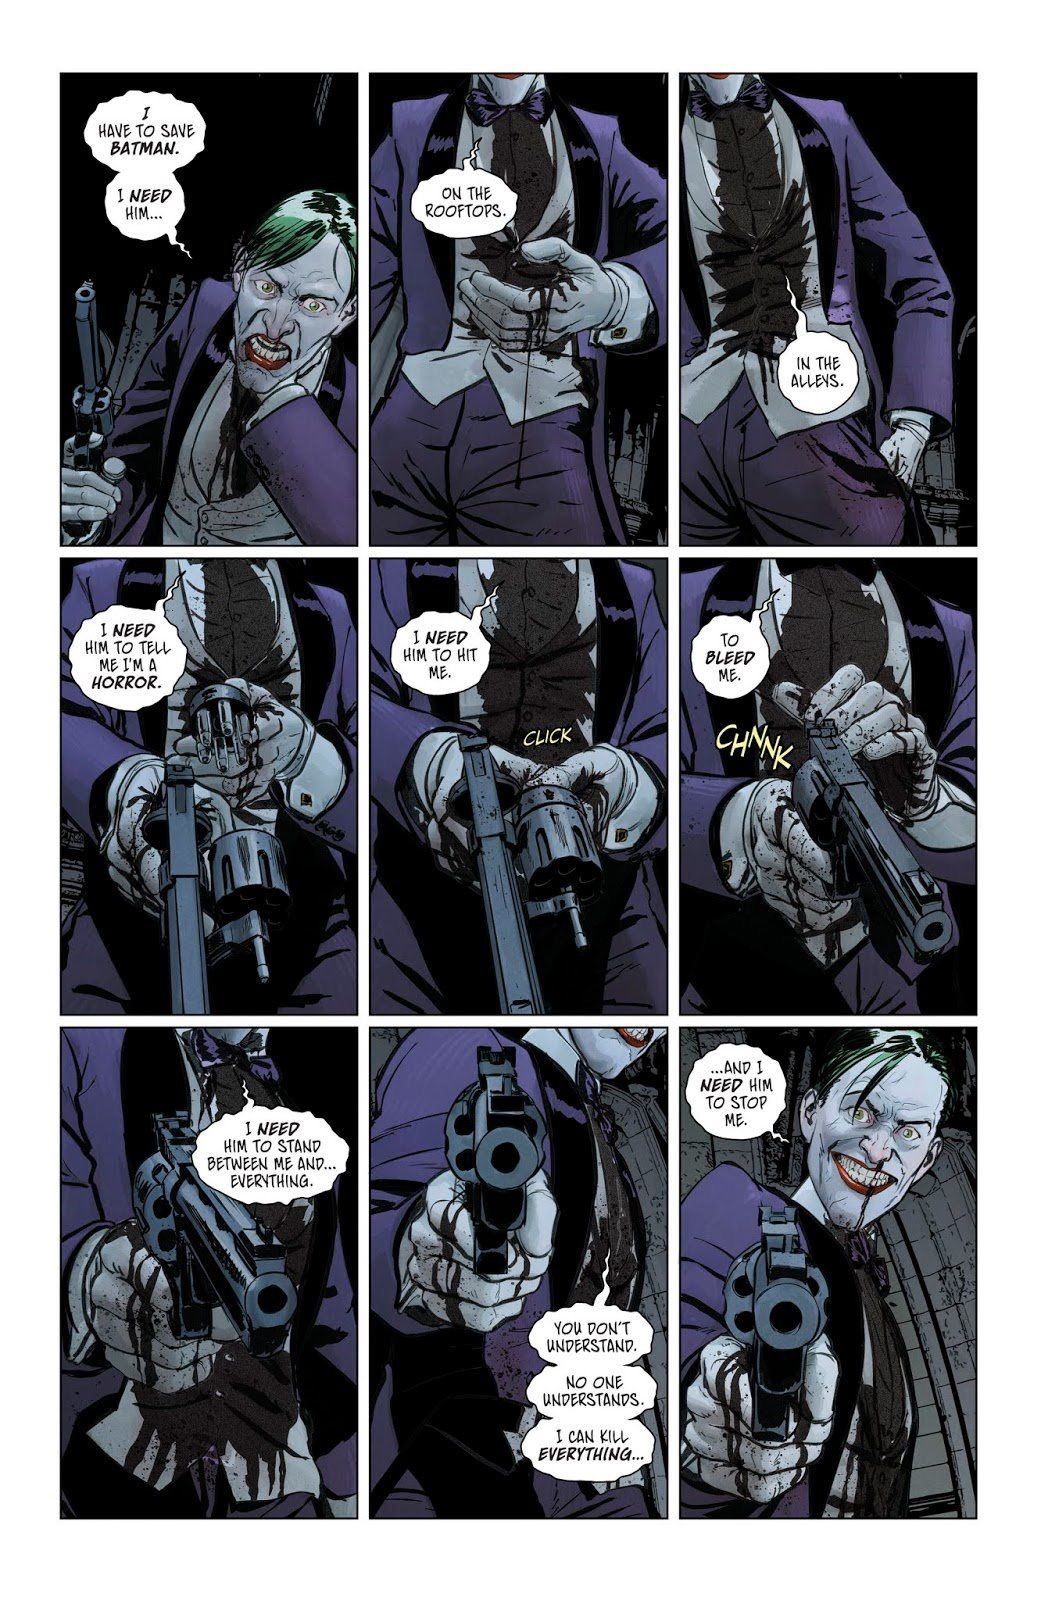 Pin By Mikaelprincipio On Dc Joker Harley Comic Books Art